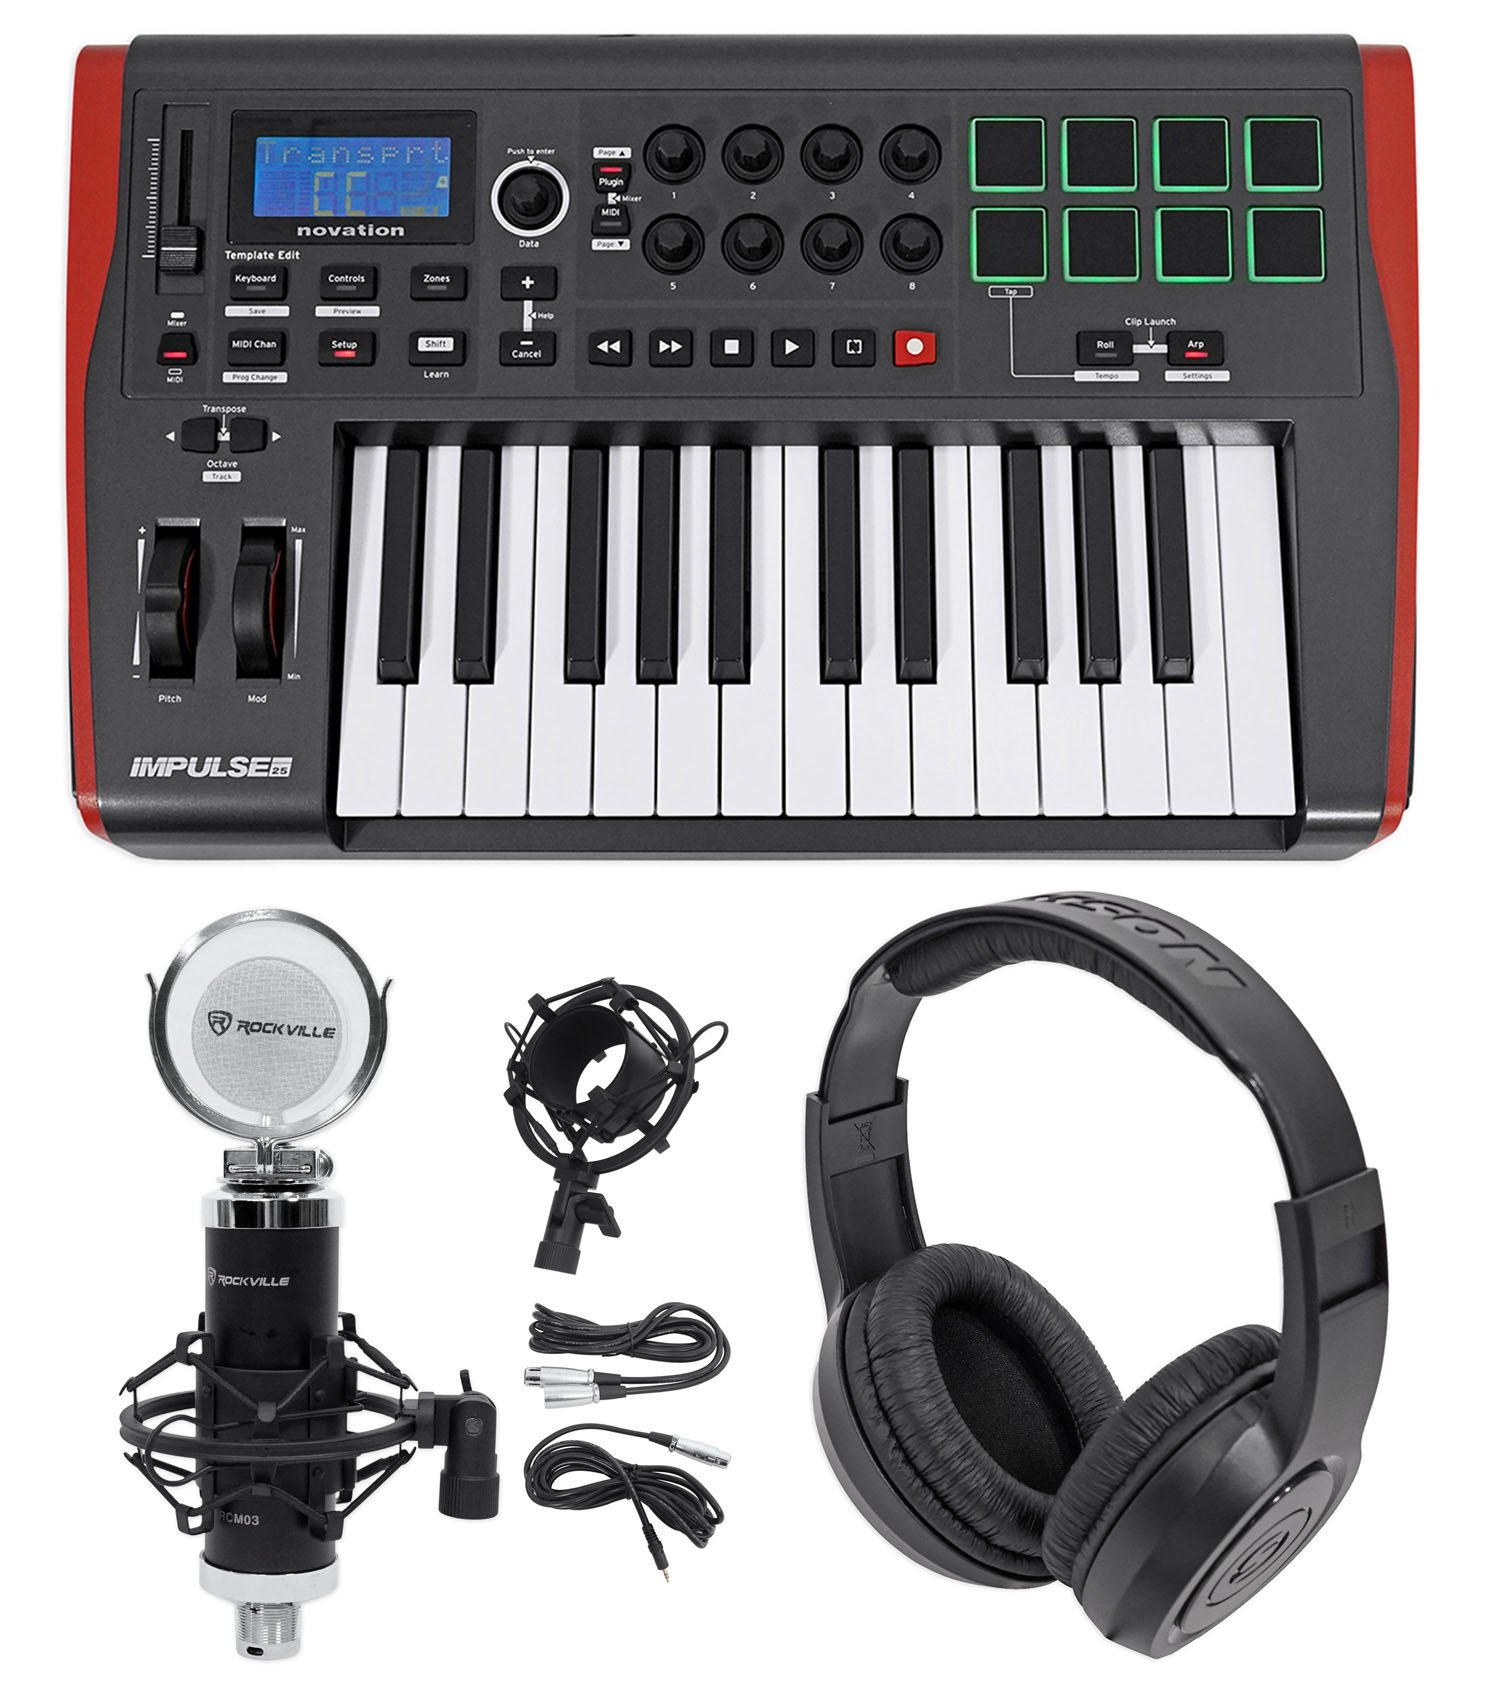 Novation IMPULSE 25 Ableton Live 25-Key USB Keyboard Controller+Mic+Headphones by Novation